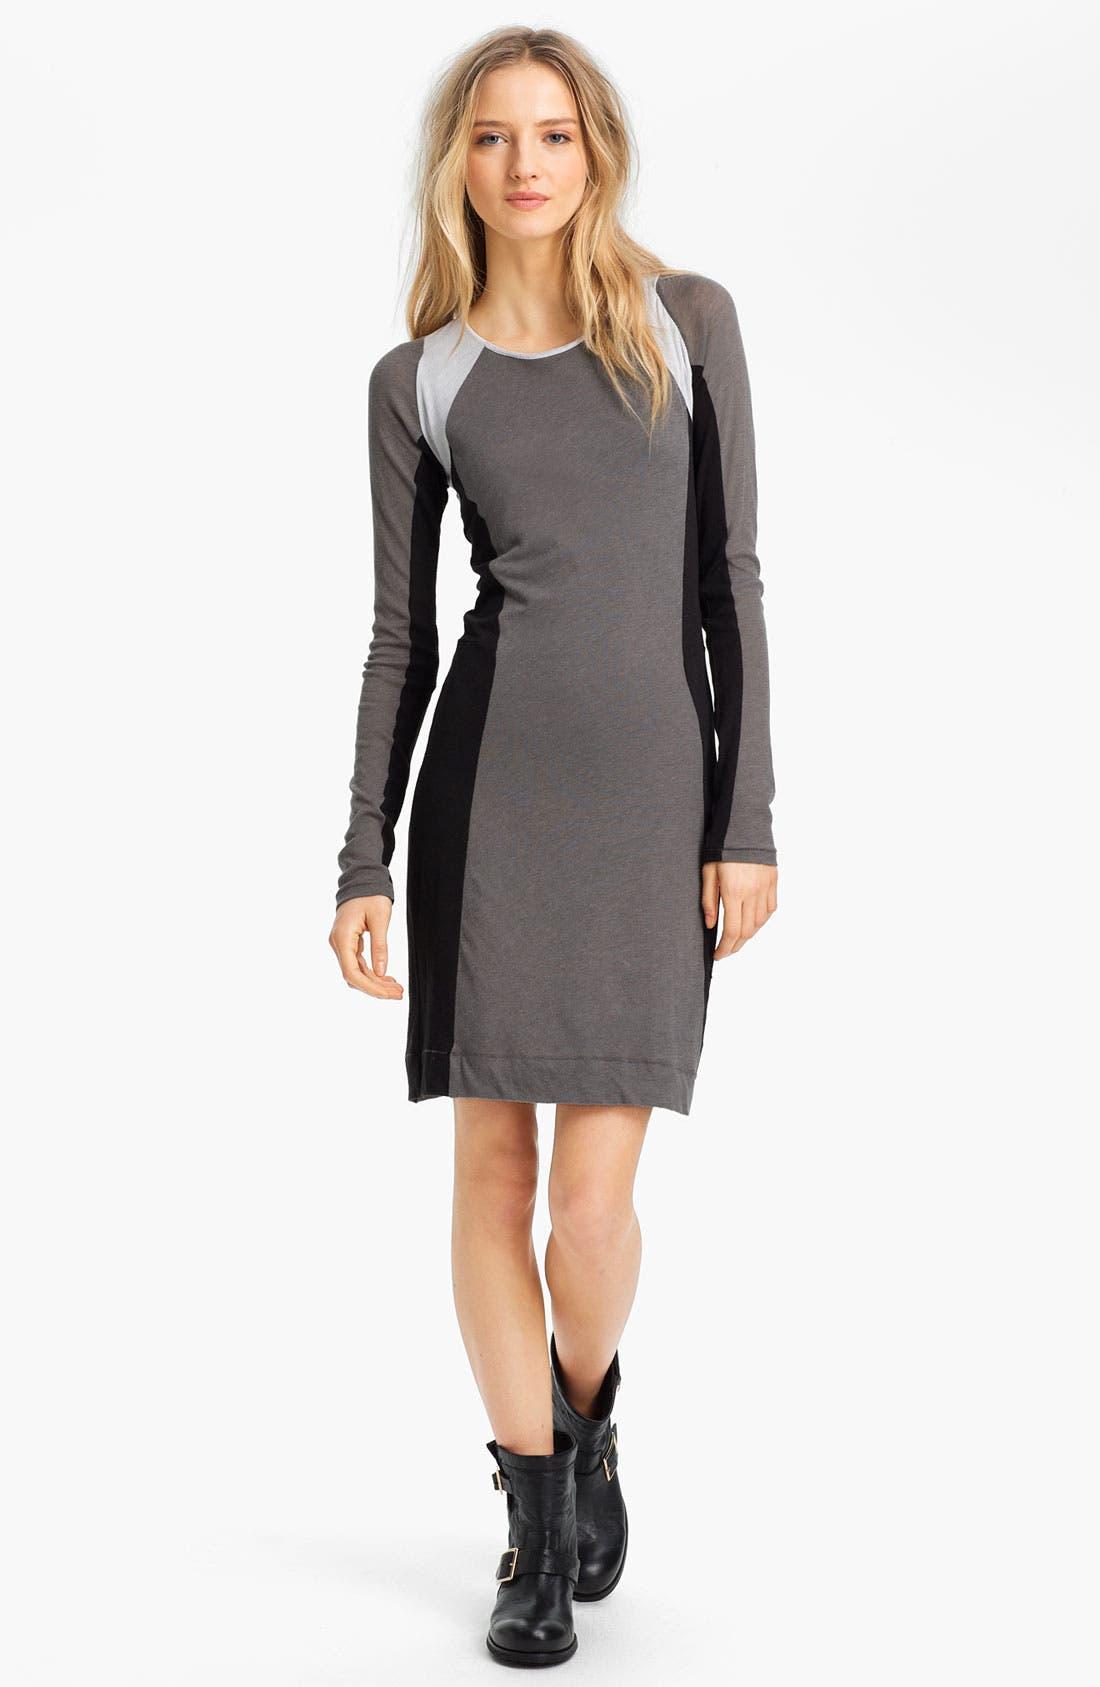 Alternate Image 1 Selected - rag & bone 'The Moto' Contrast Panel Dress